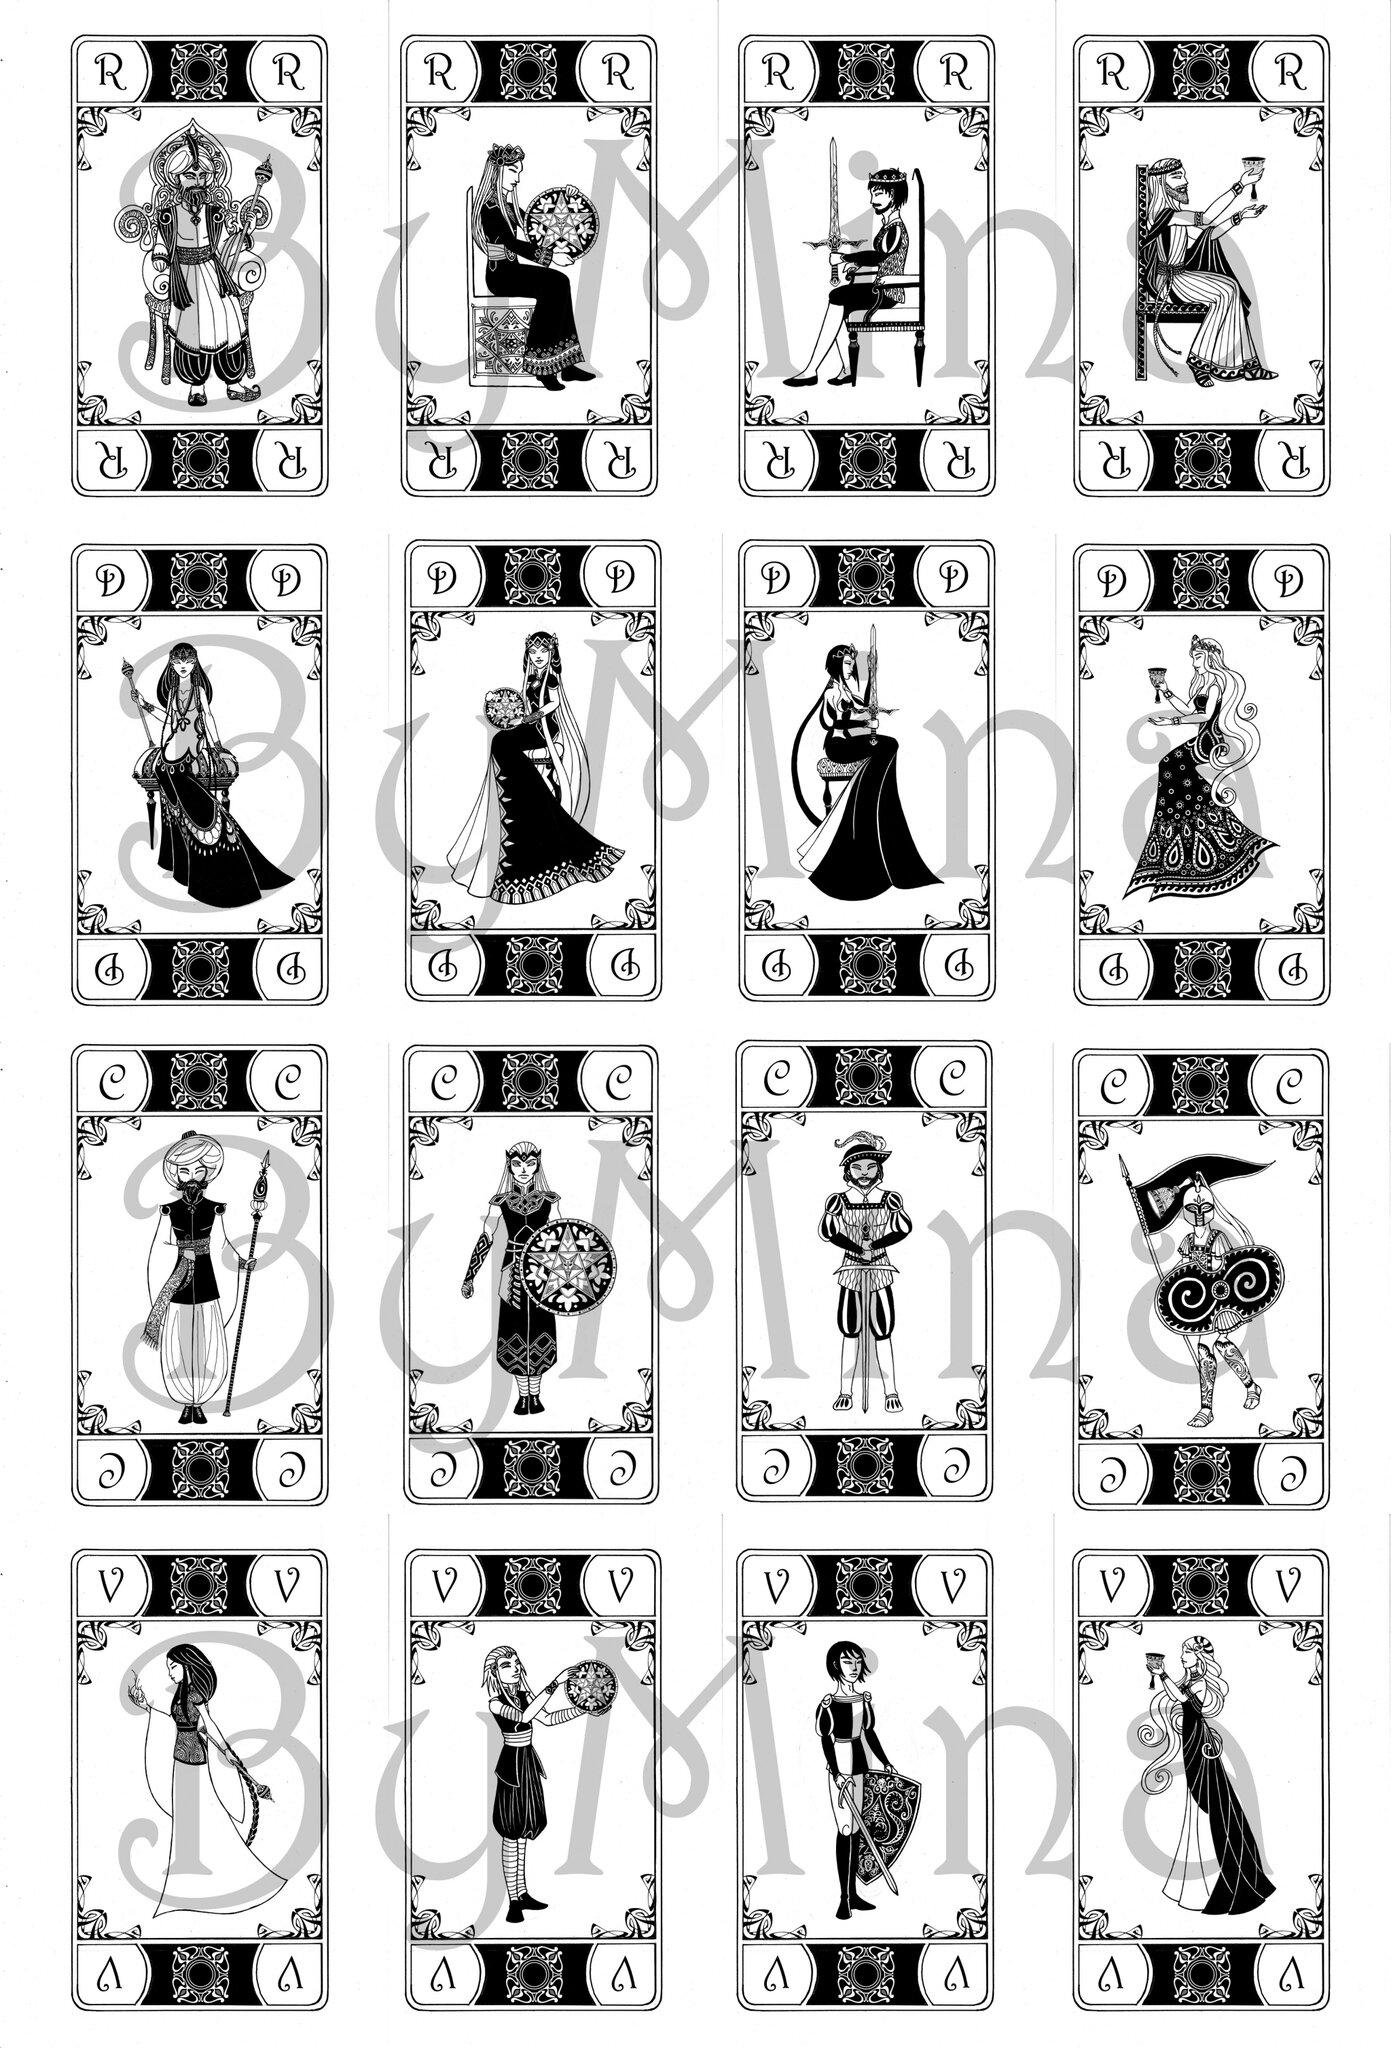 Cartes Figures